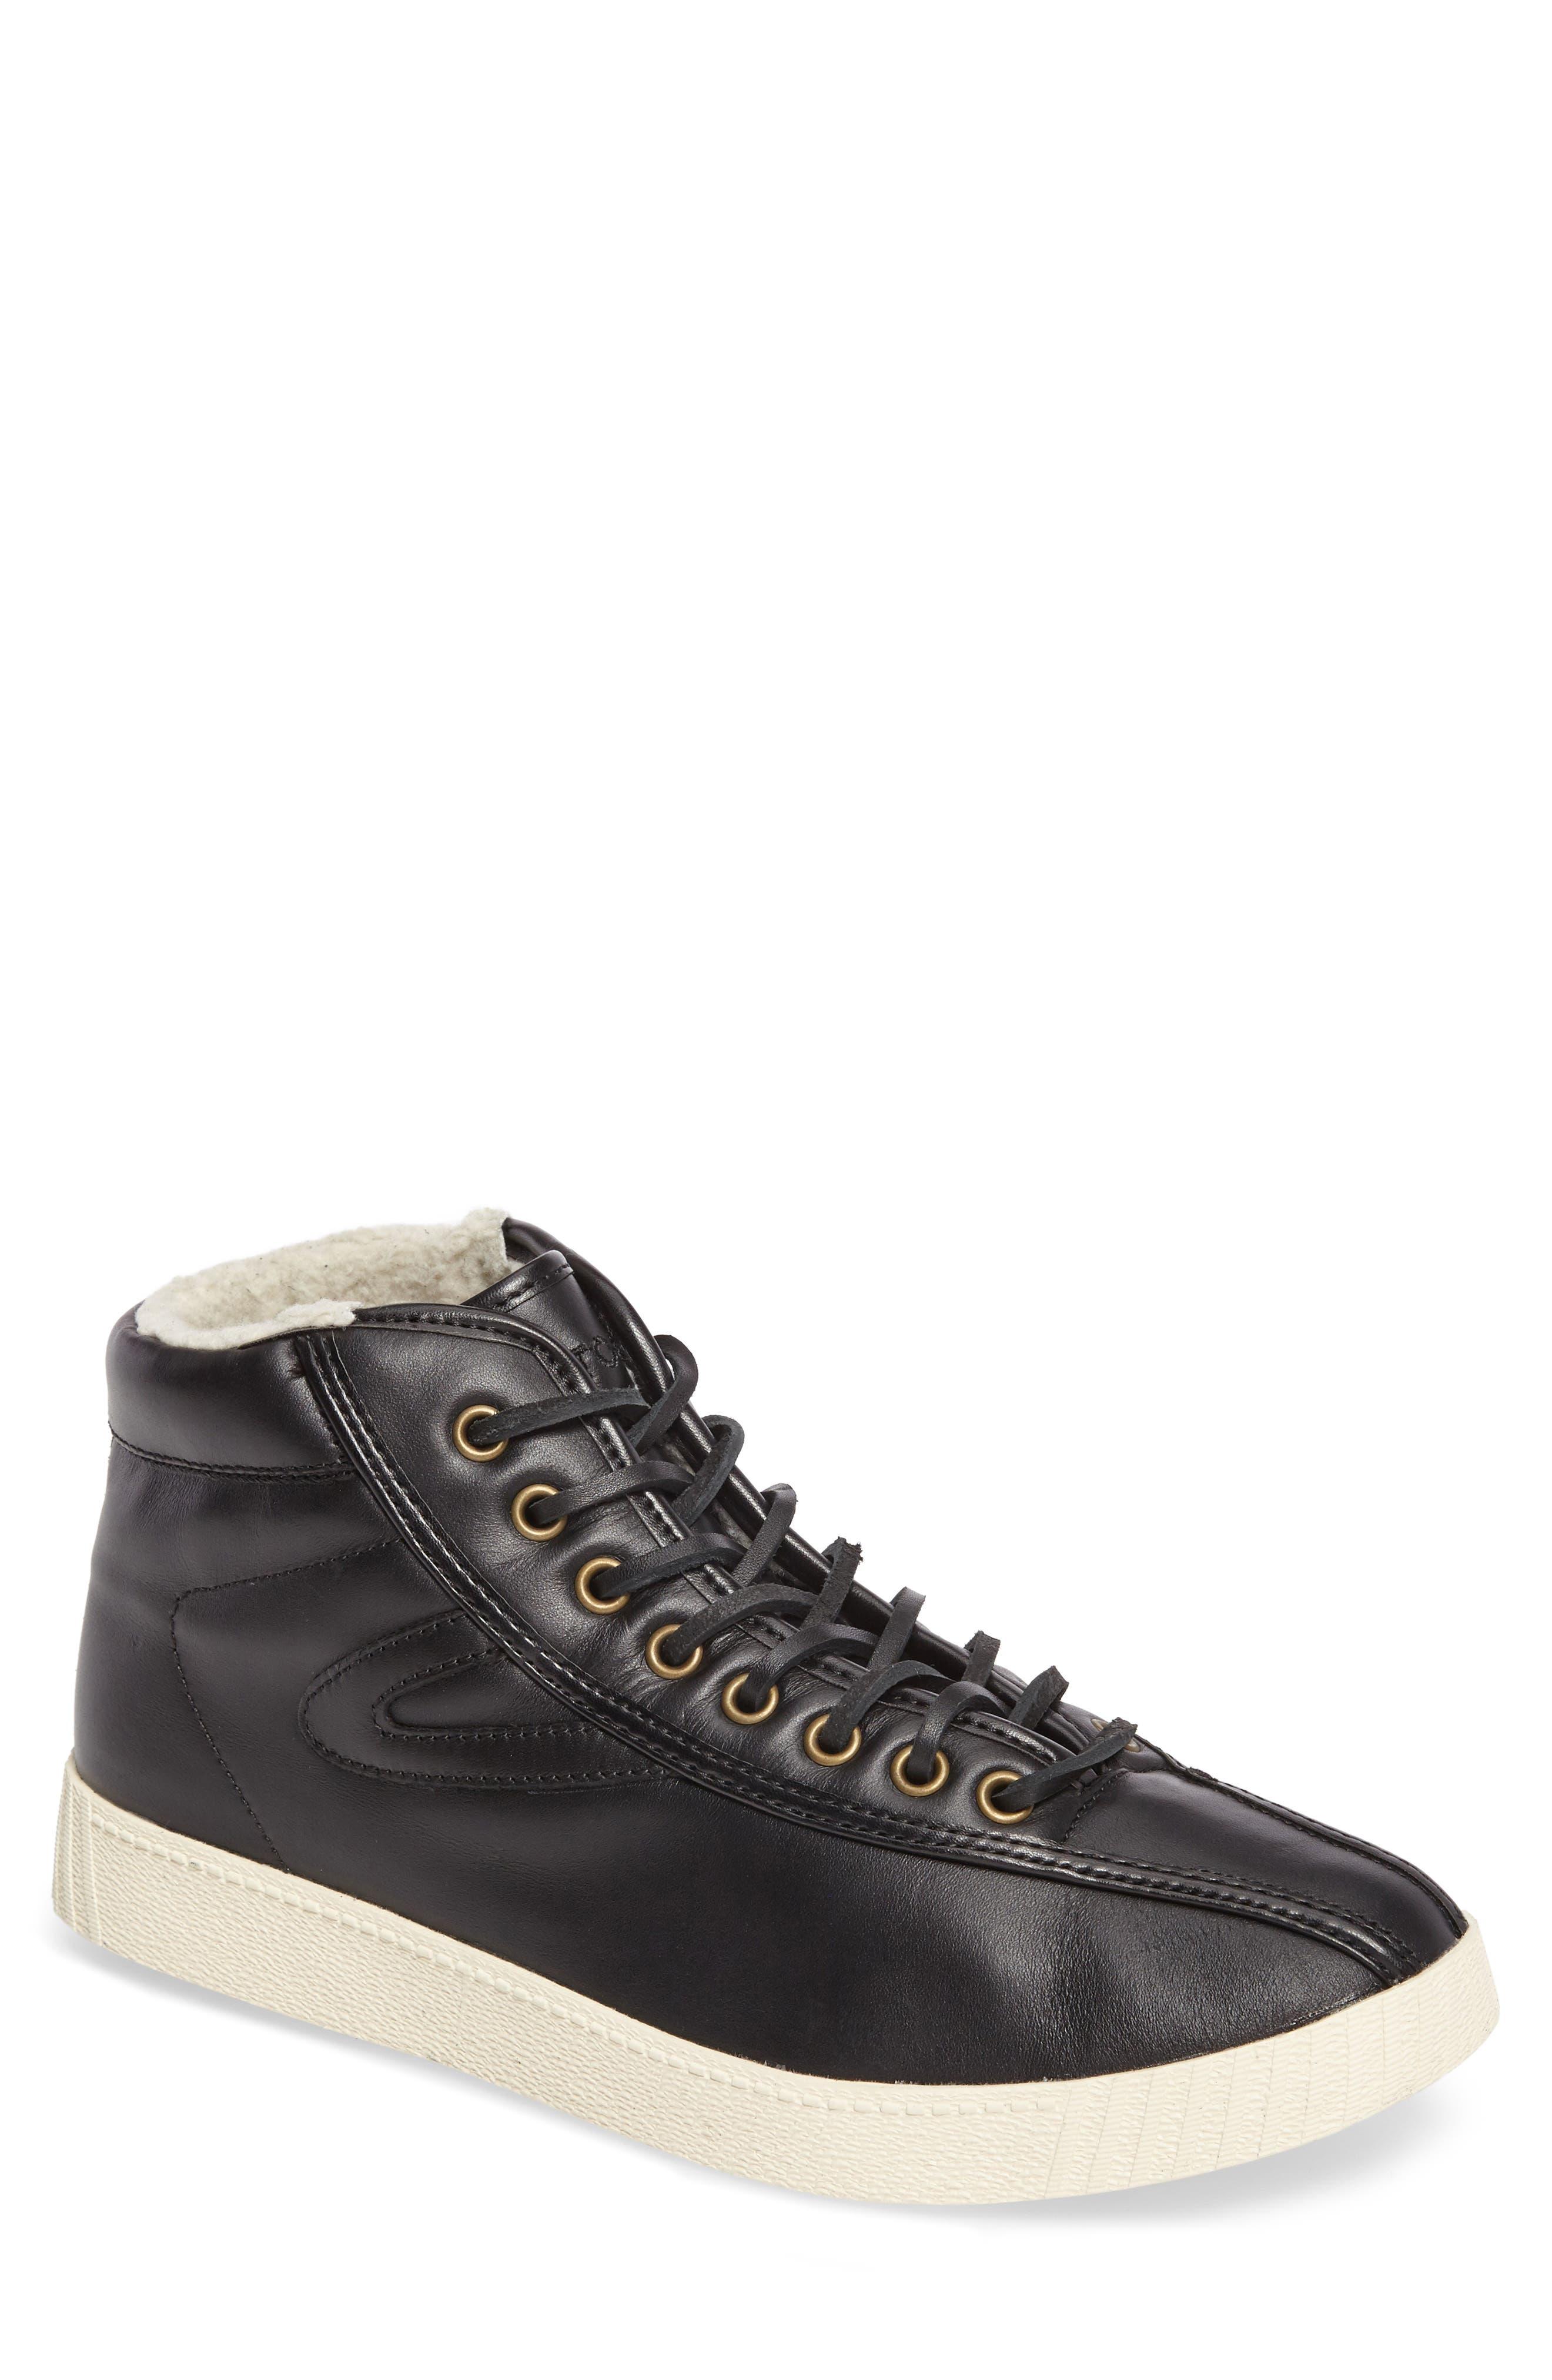 Tretorn Nylite Hi 2 Sneaker (Men)